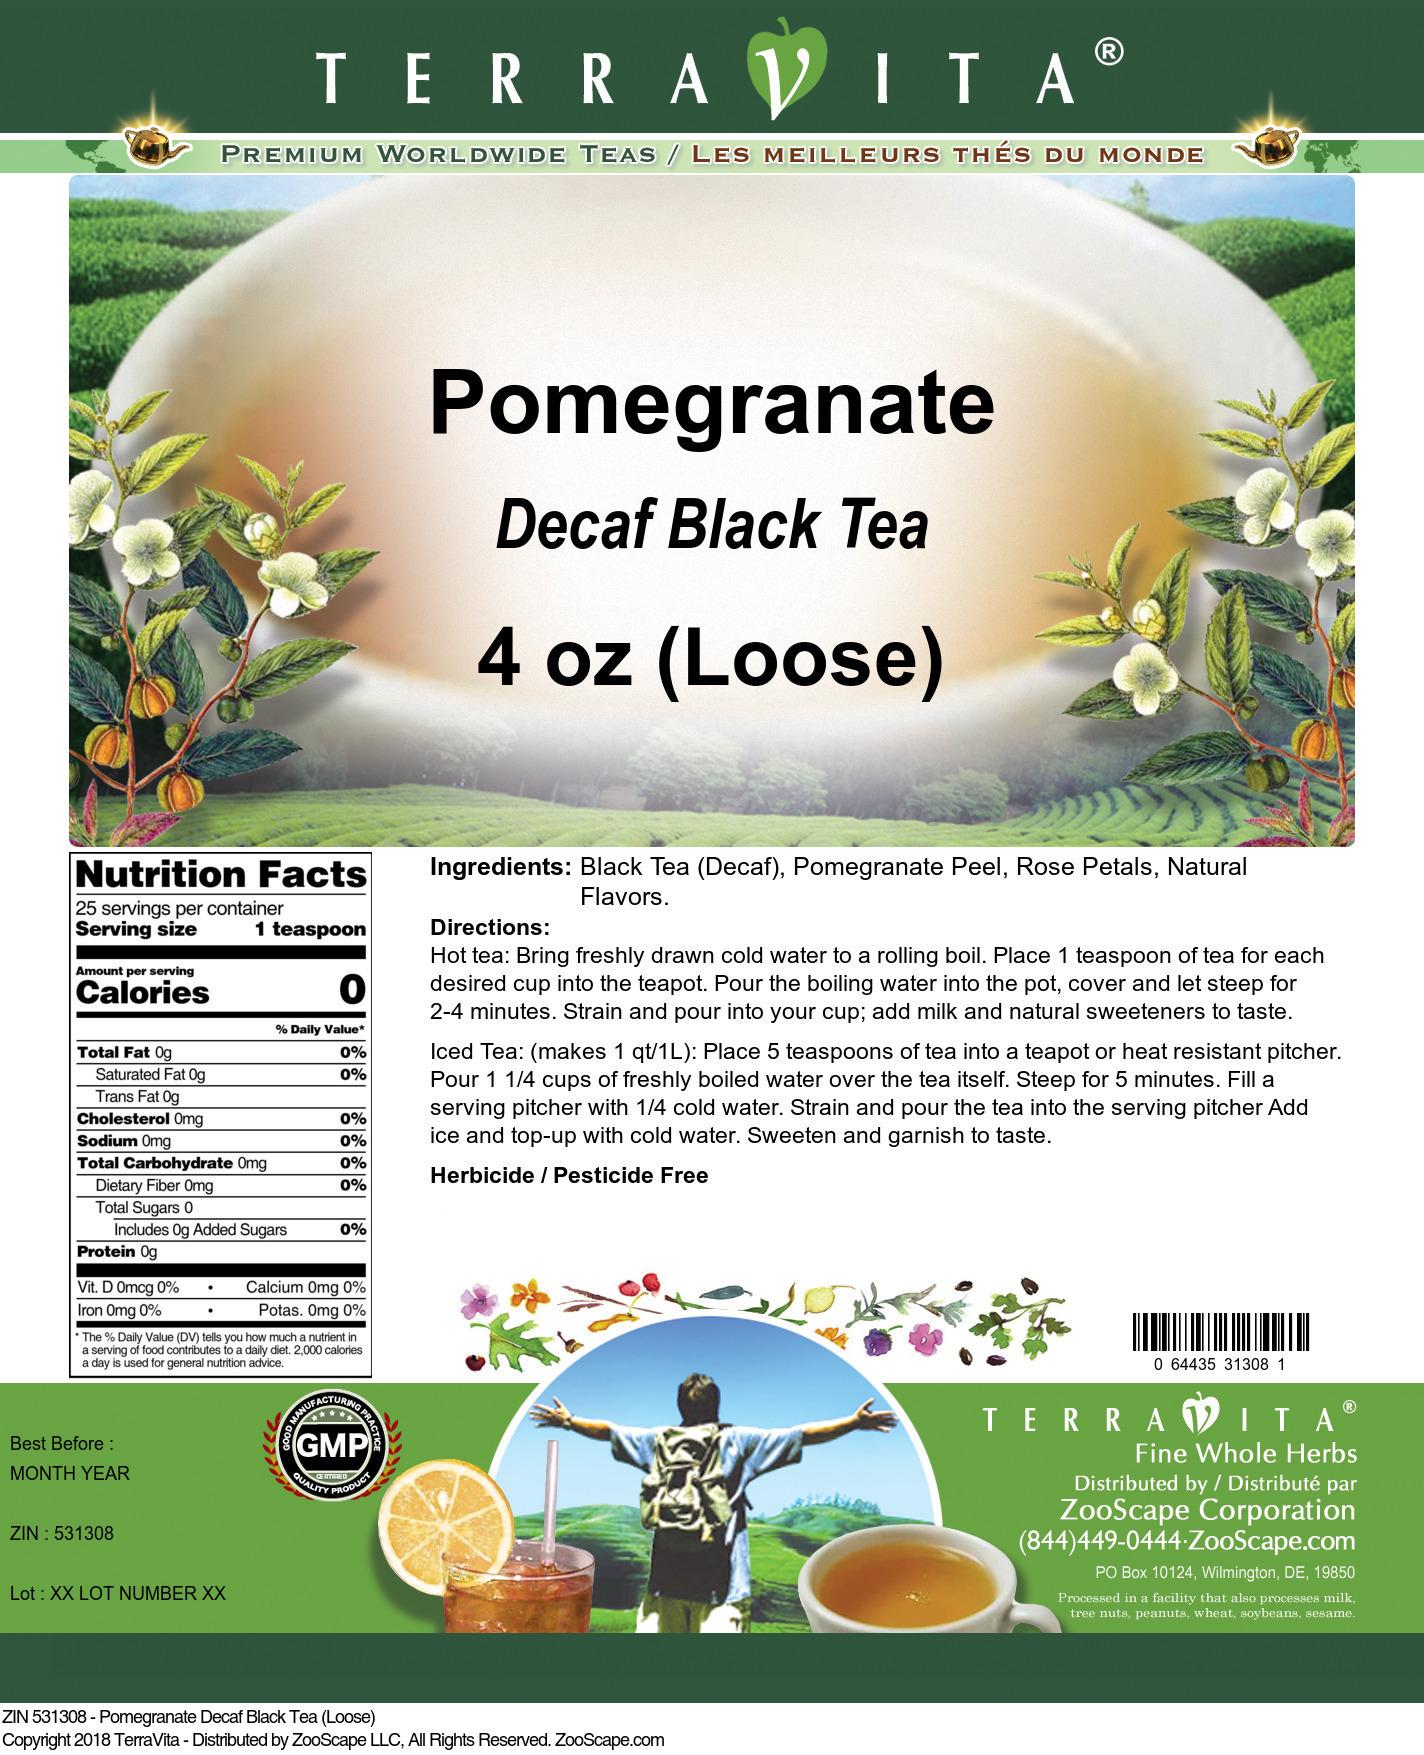 Pomegranate Decaf Black Tea (Loose)